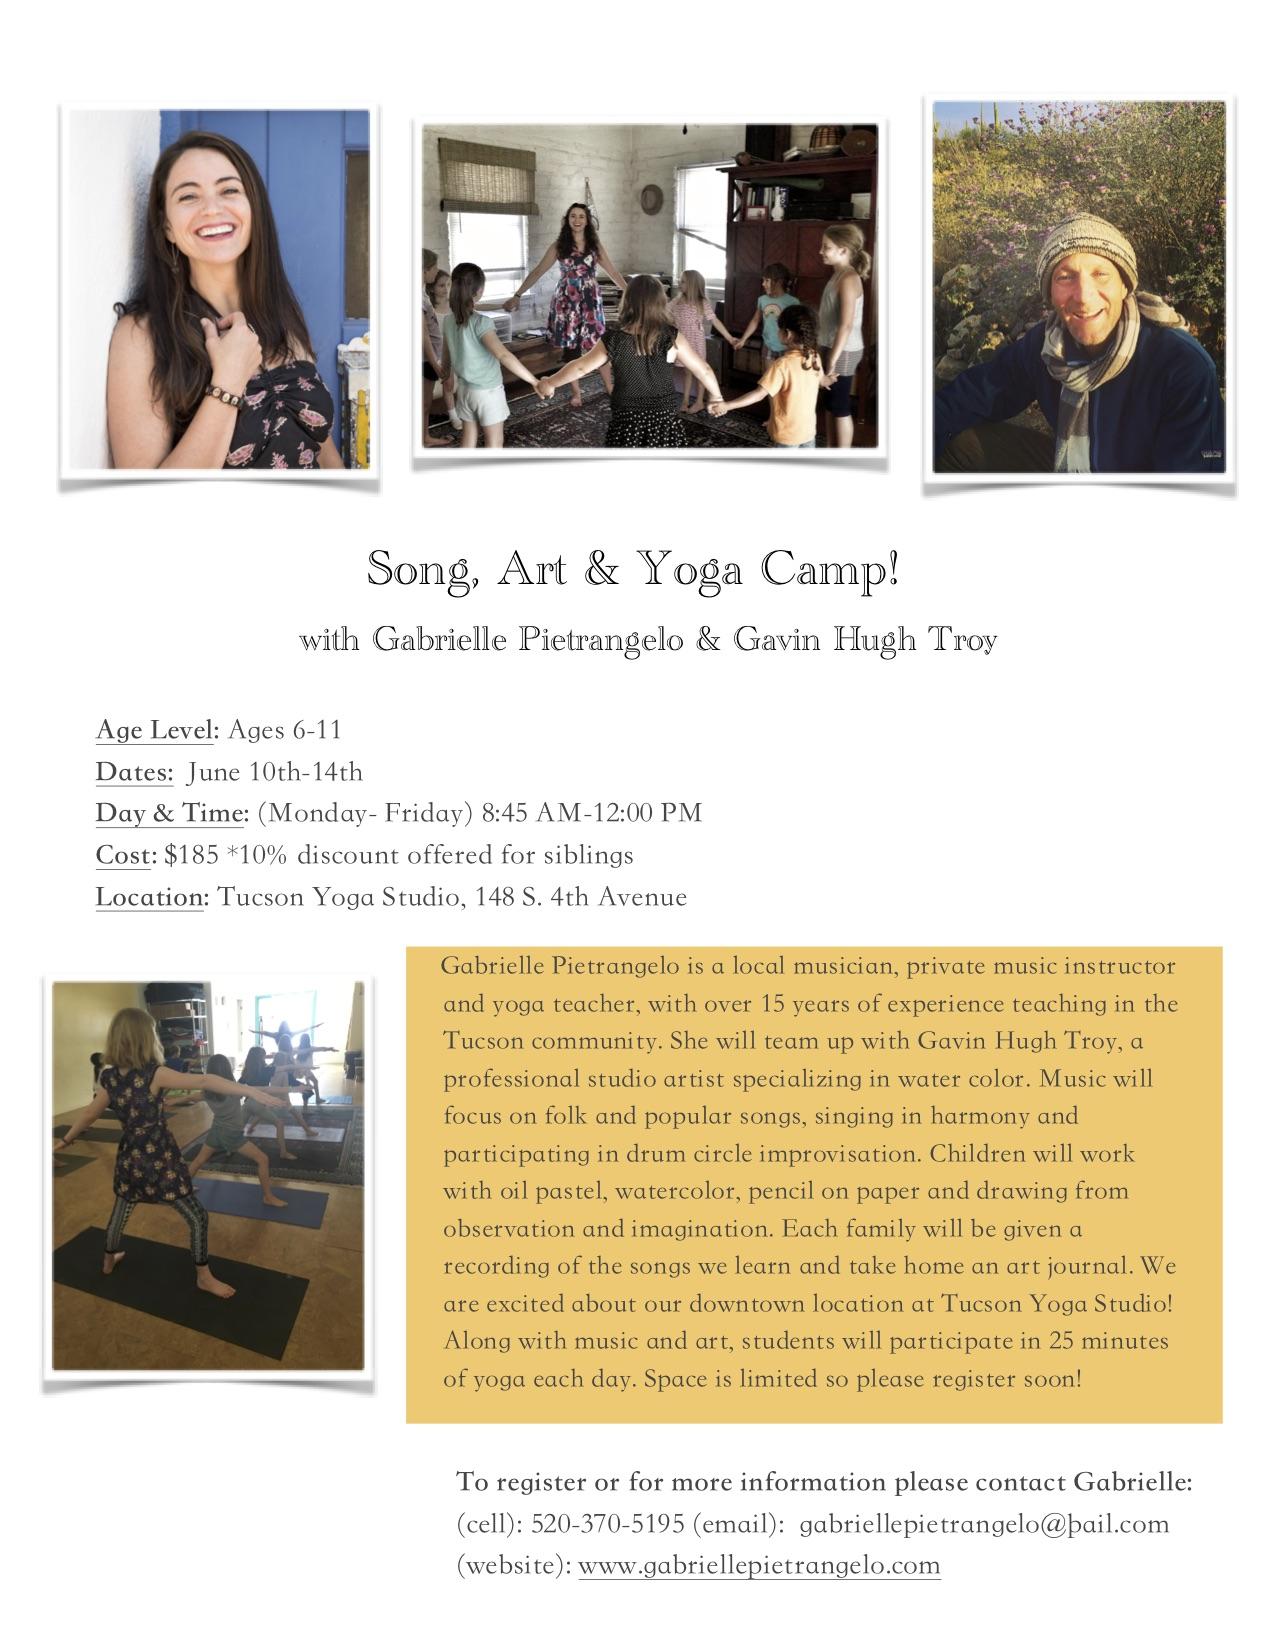 Song, Art & Yoga Camp jpeg 2019.jpg